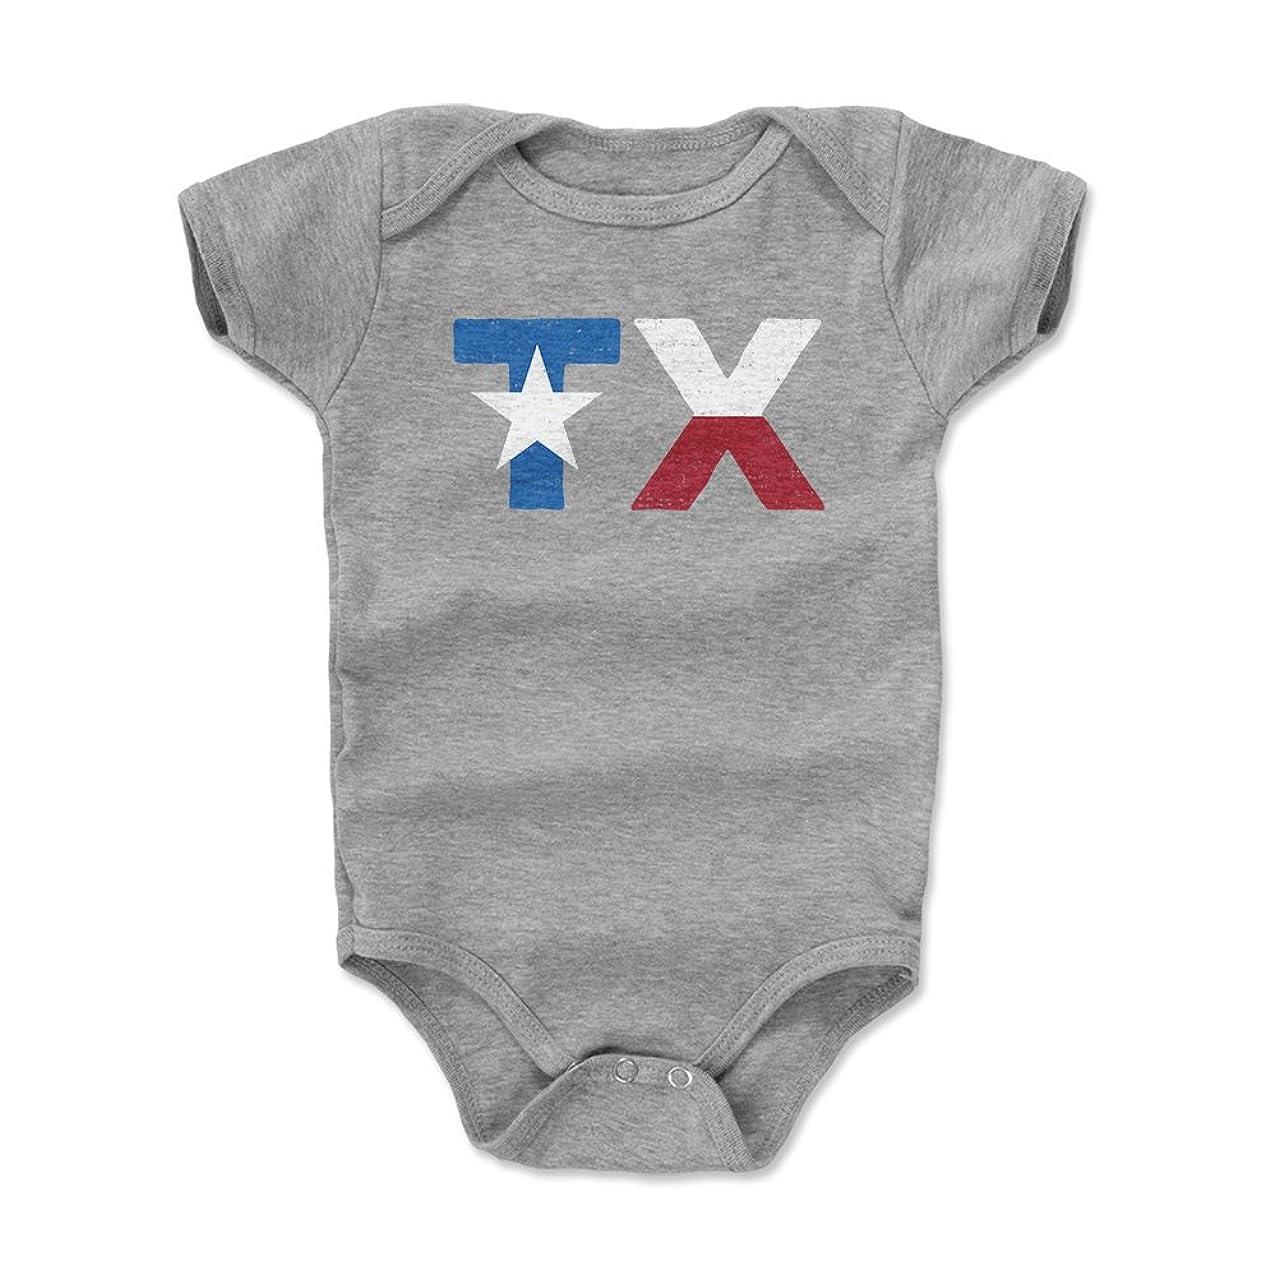 500 LEVEL Texas Baby Clothes & Onesie (3-6, 6-12, 12-18, 18-24 Months) - Texas TX Star